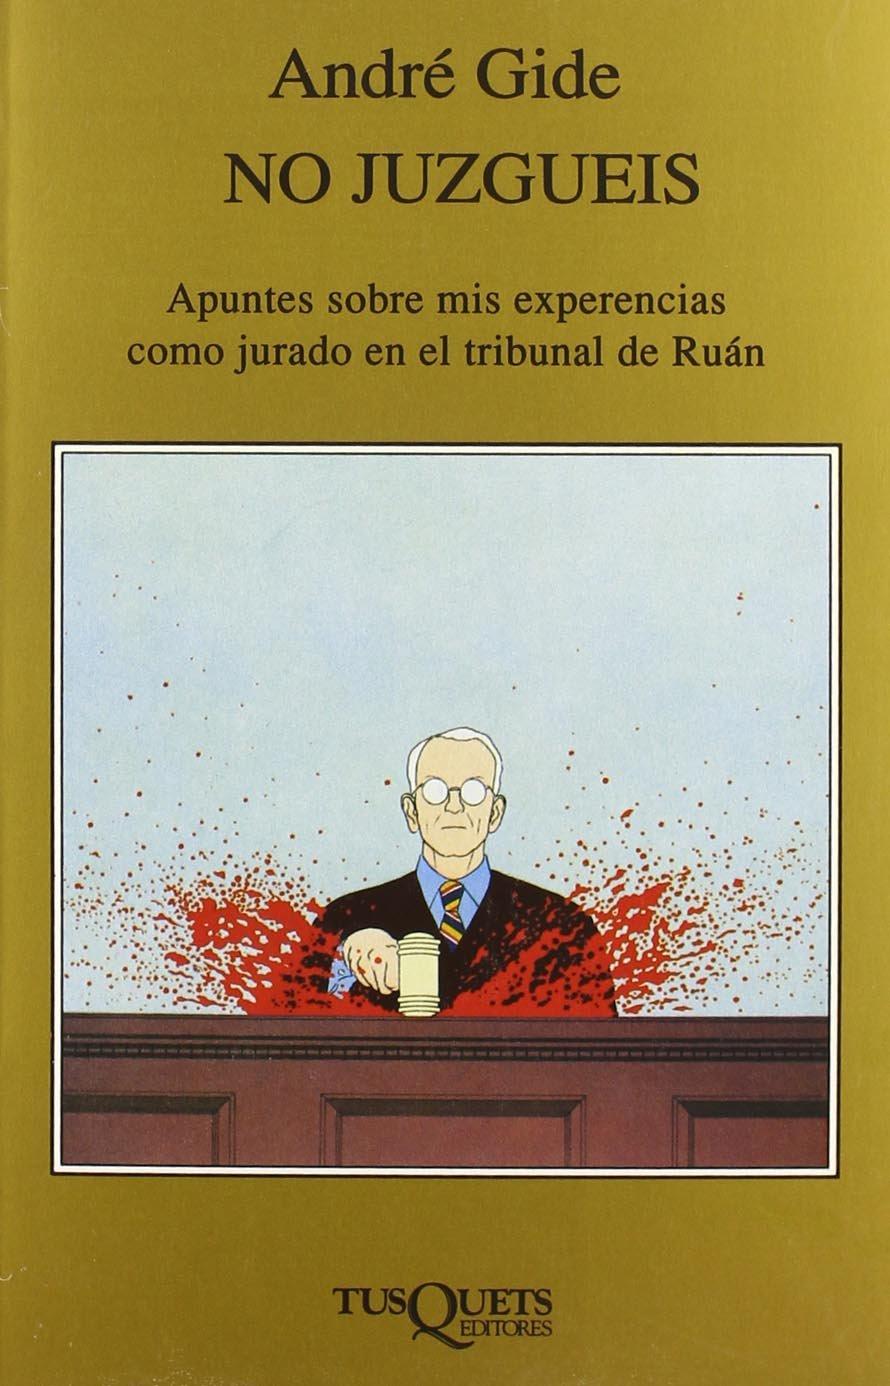 No juzguéis - André Gide 71oibXOgH9L